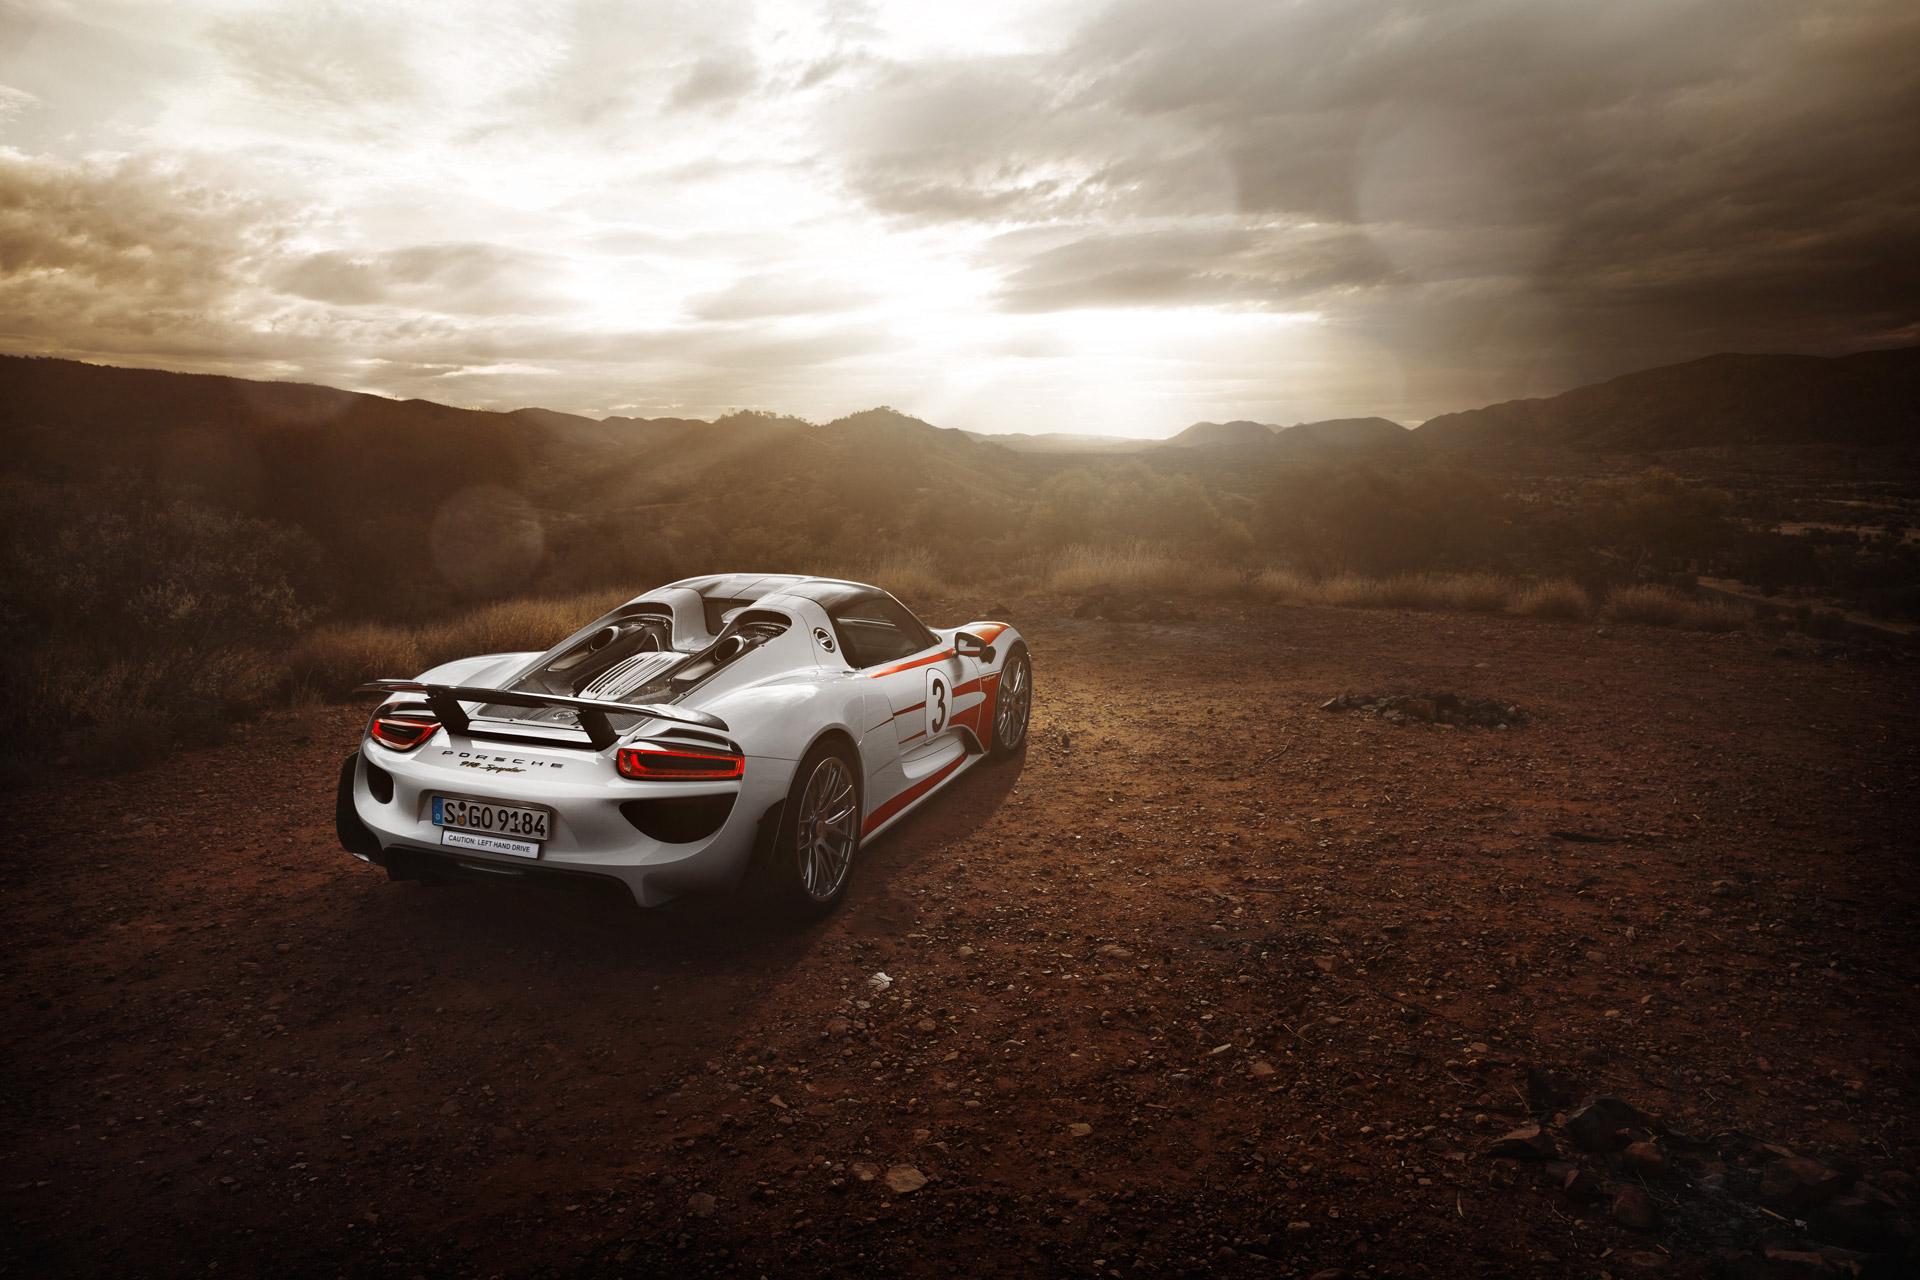 918 Of 918: Porsche Completes Stellar Supercar's Production